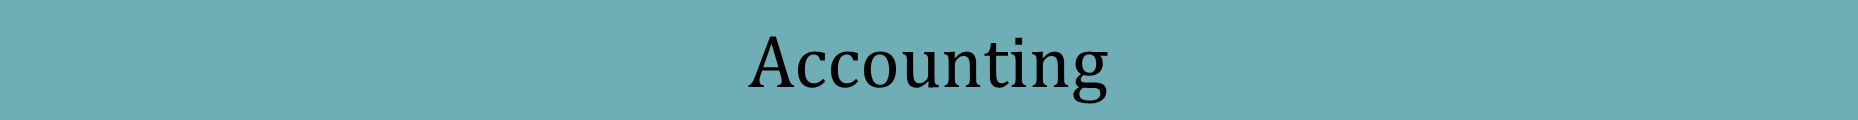 accountingbanner.jpg